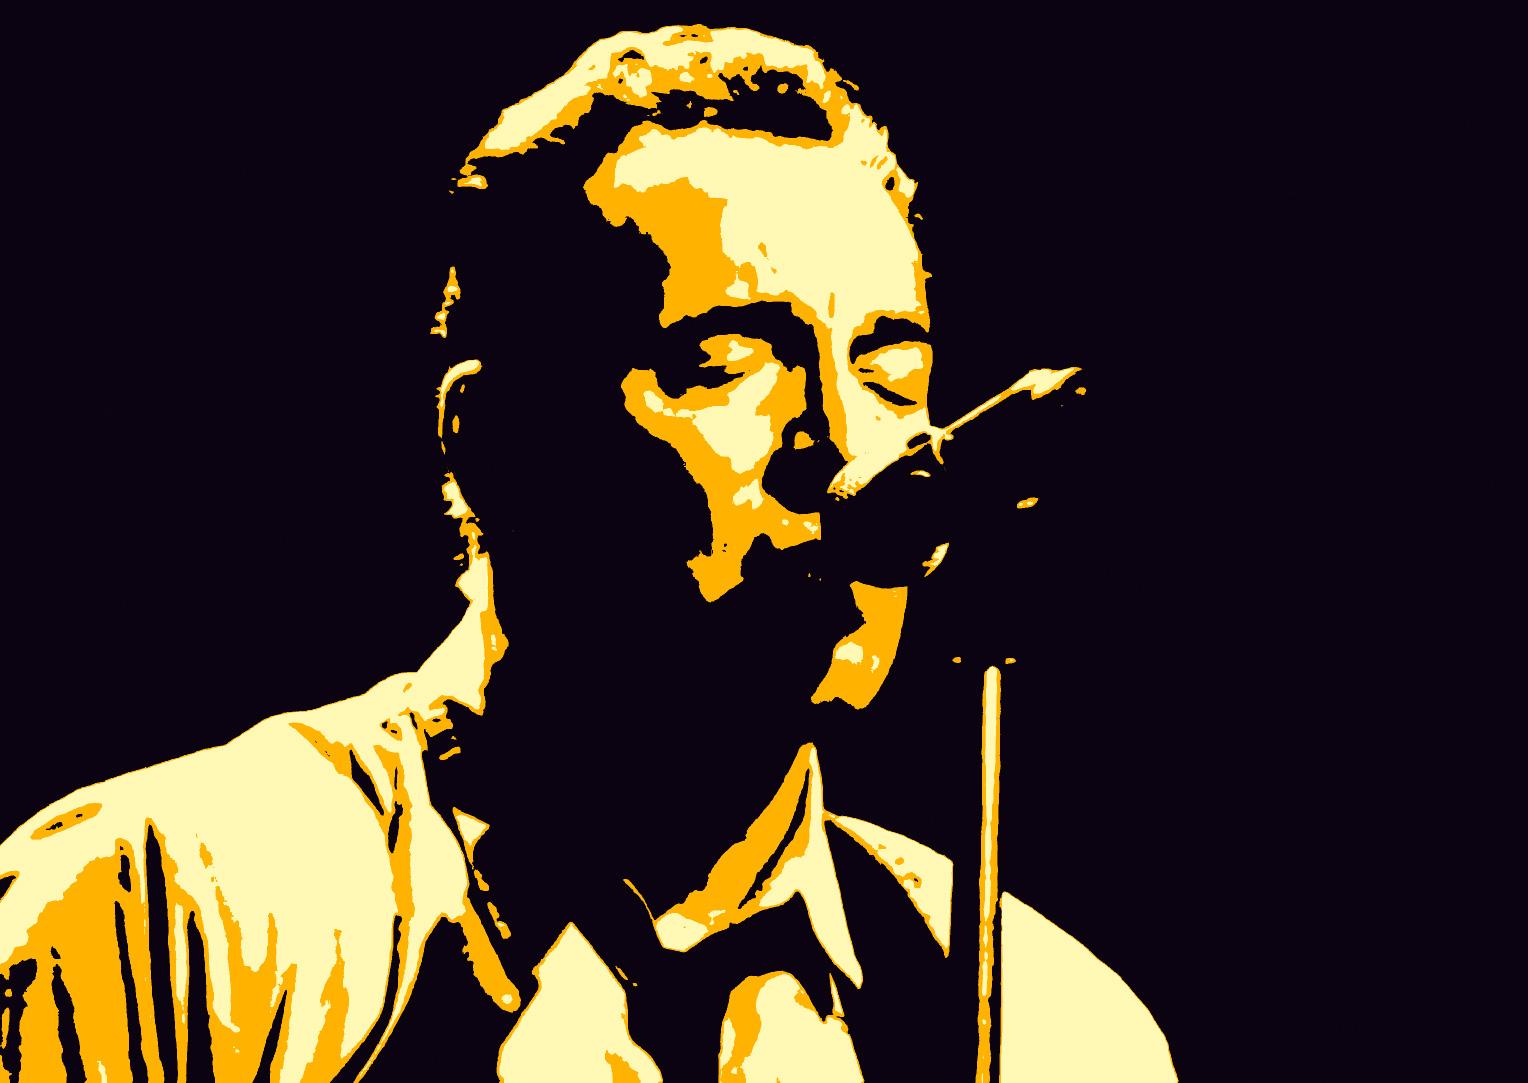 Bruce Springsteen 2013.